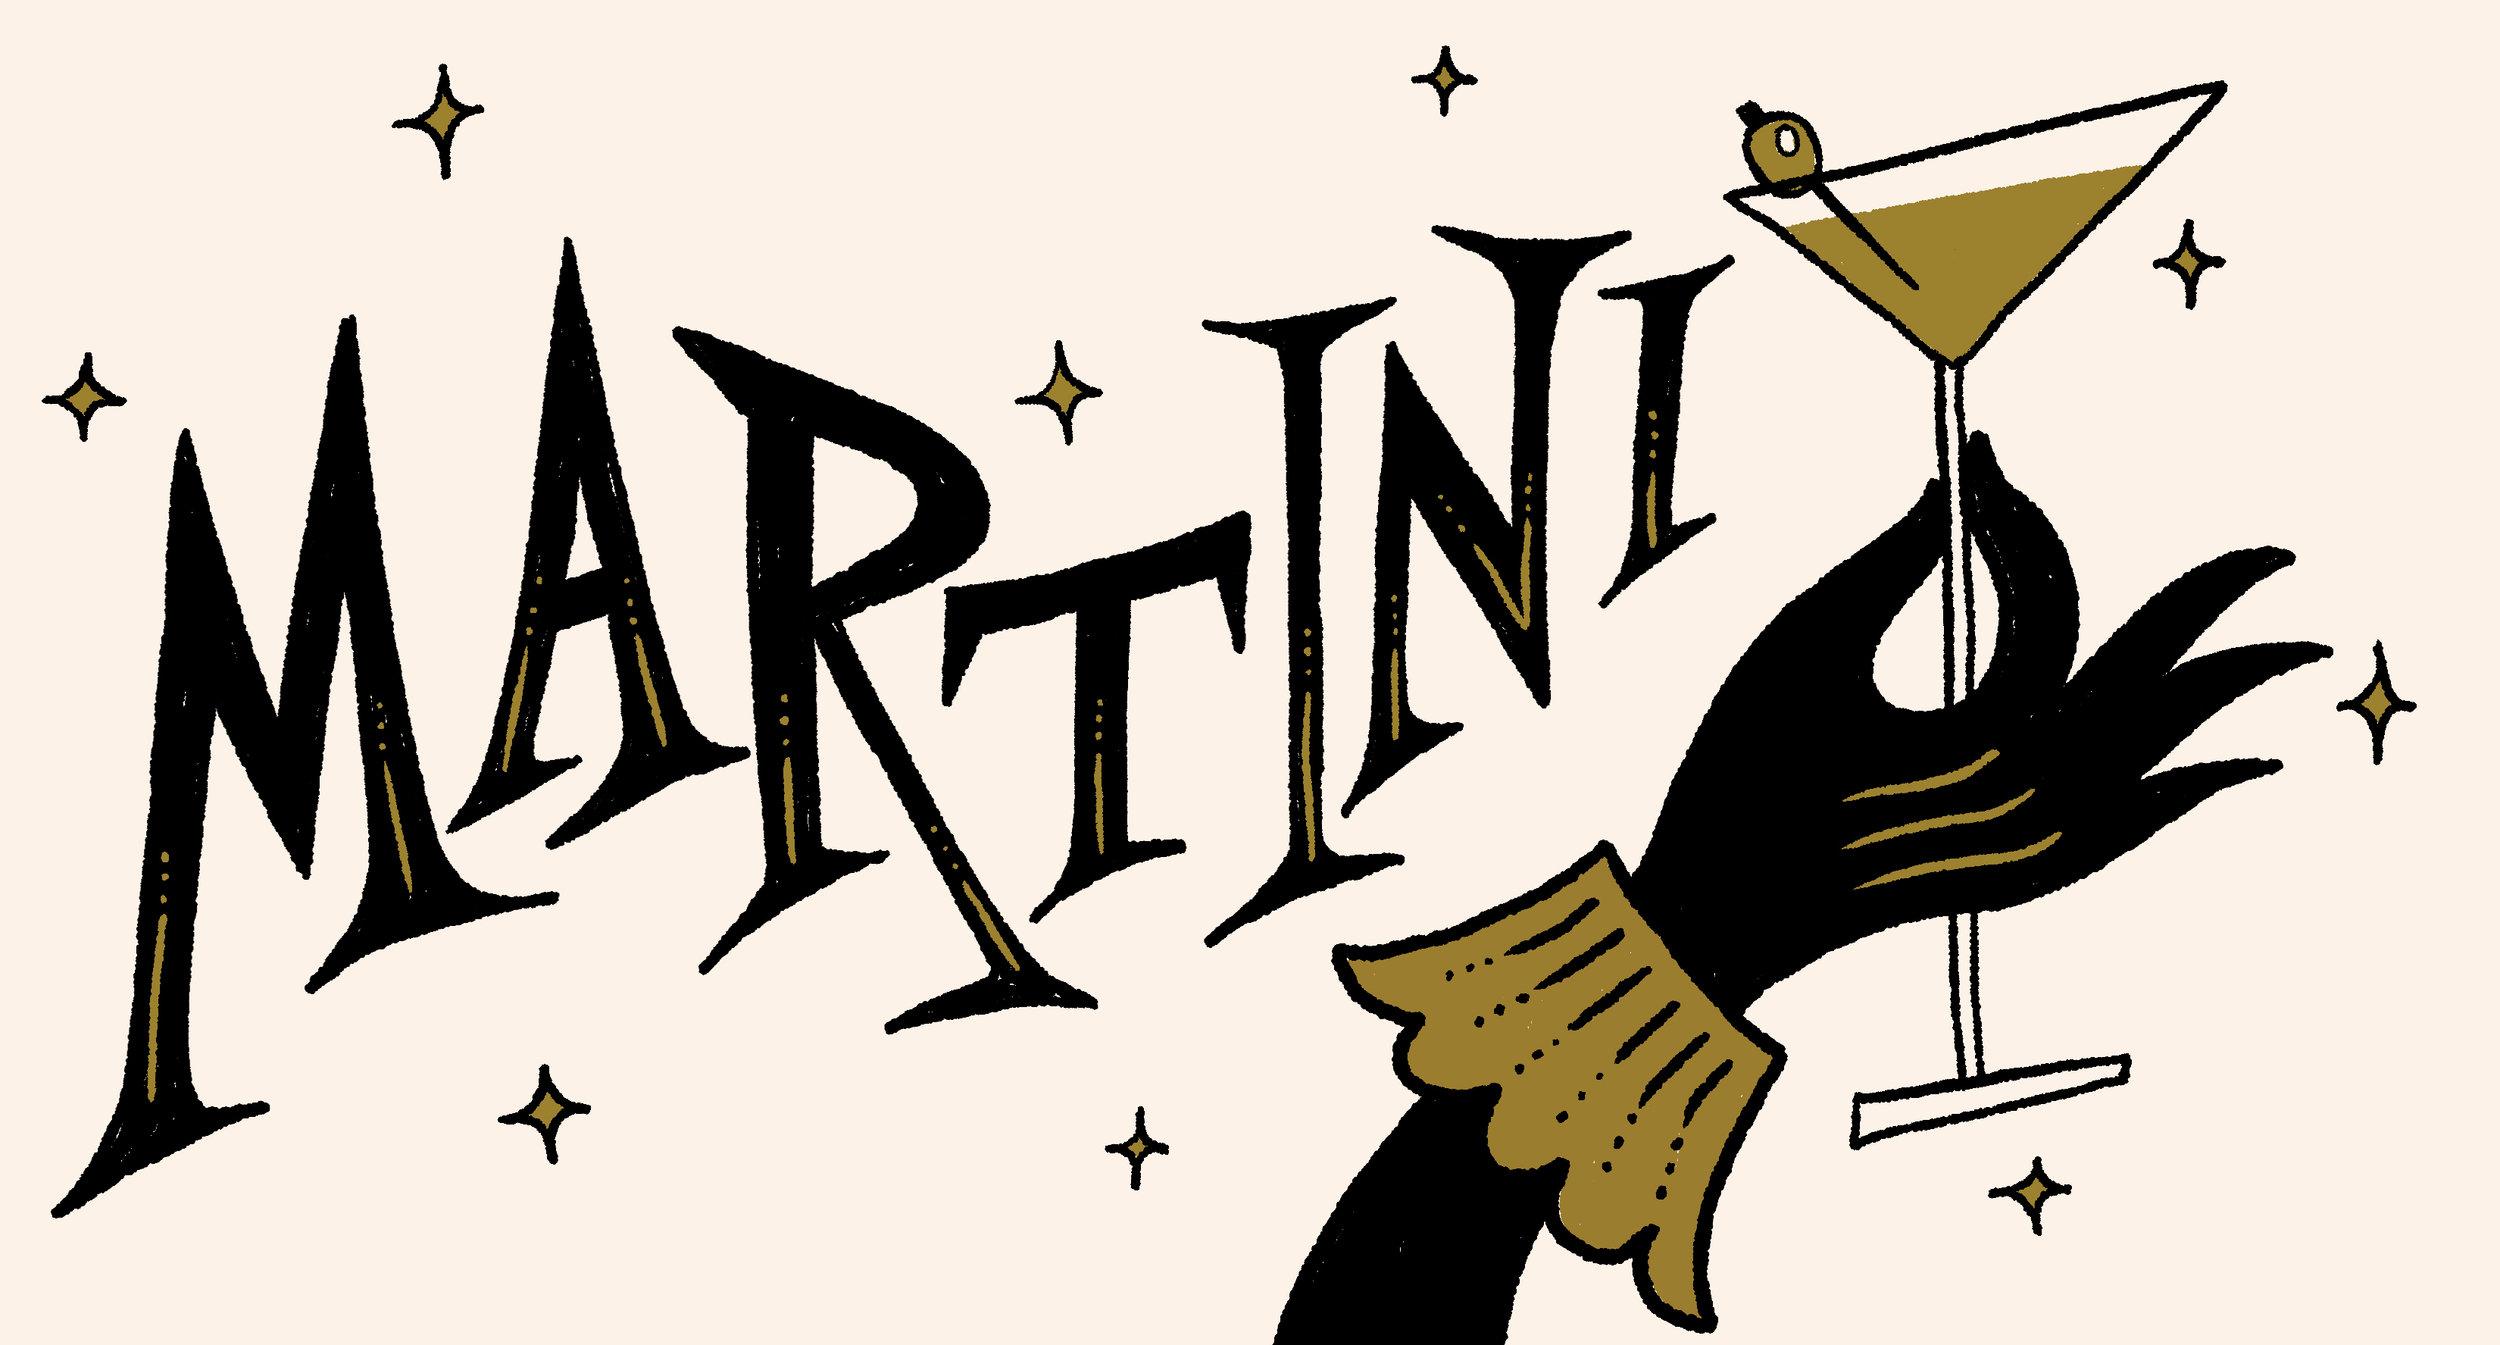 005-martini.jpg